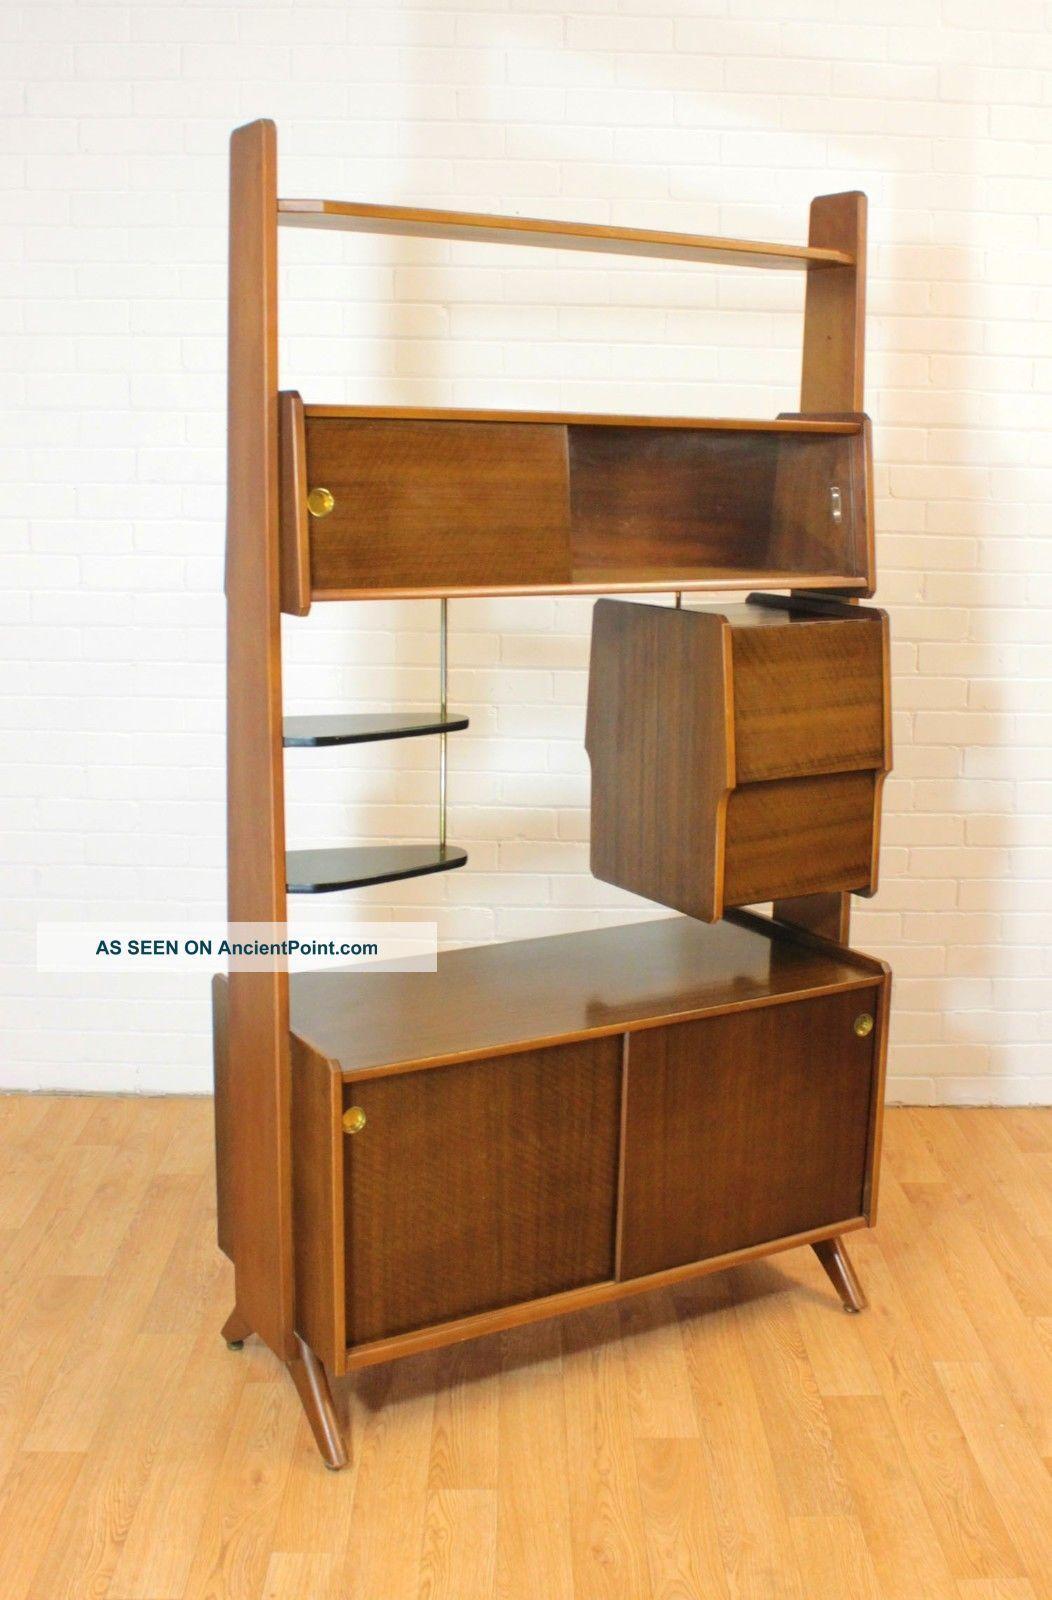 Wow Retro Upright Drinks Cabinet Bar Or Room Divider Mid Century Vintage Mcm P Furniture Design Modern Modern Style Furniture Woodworking Furniture Plans